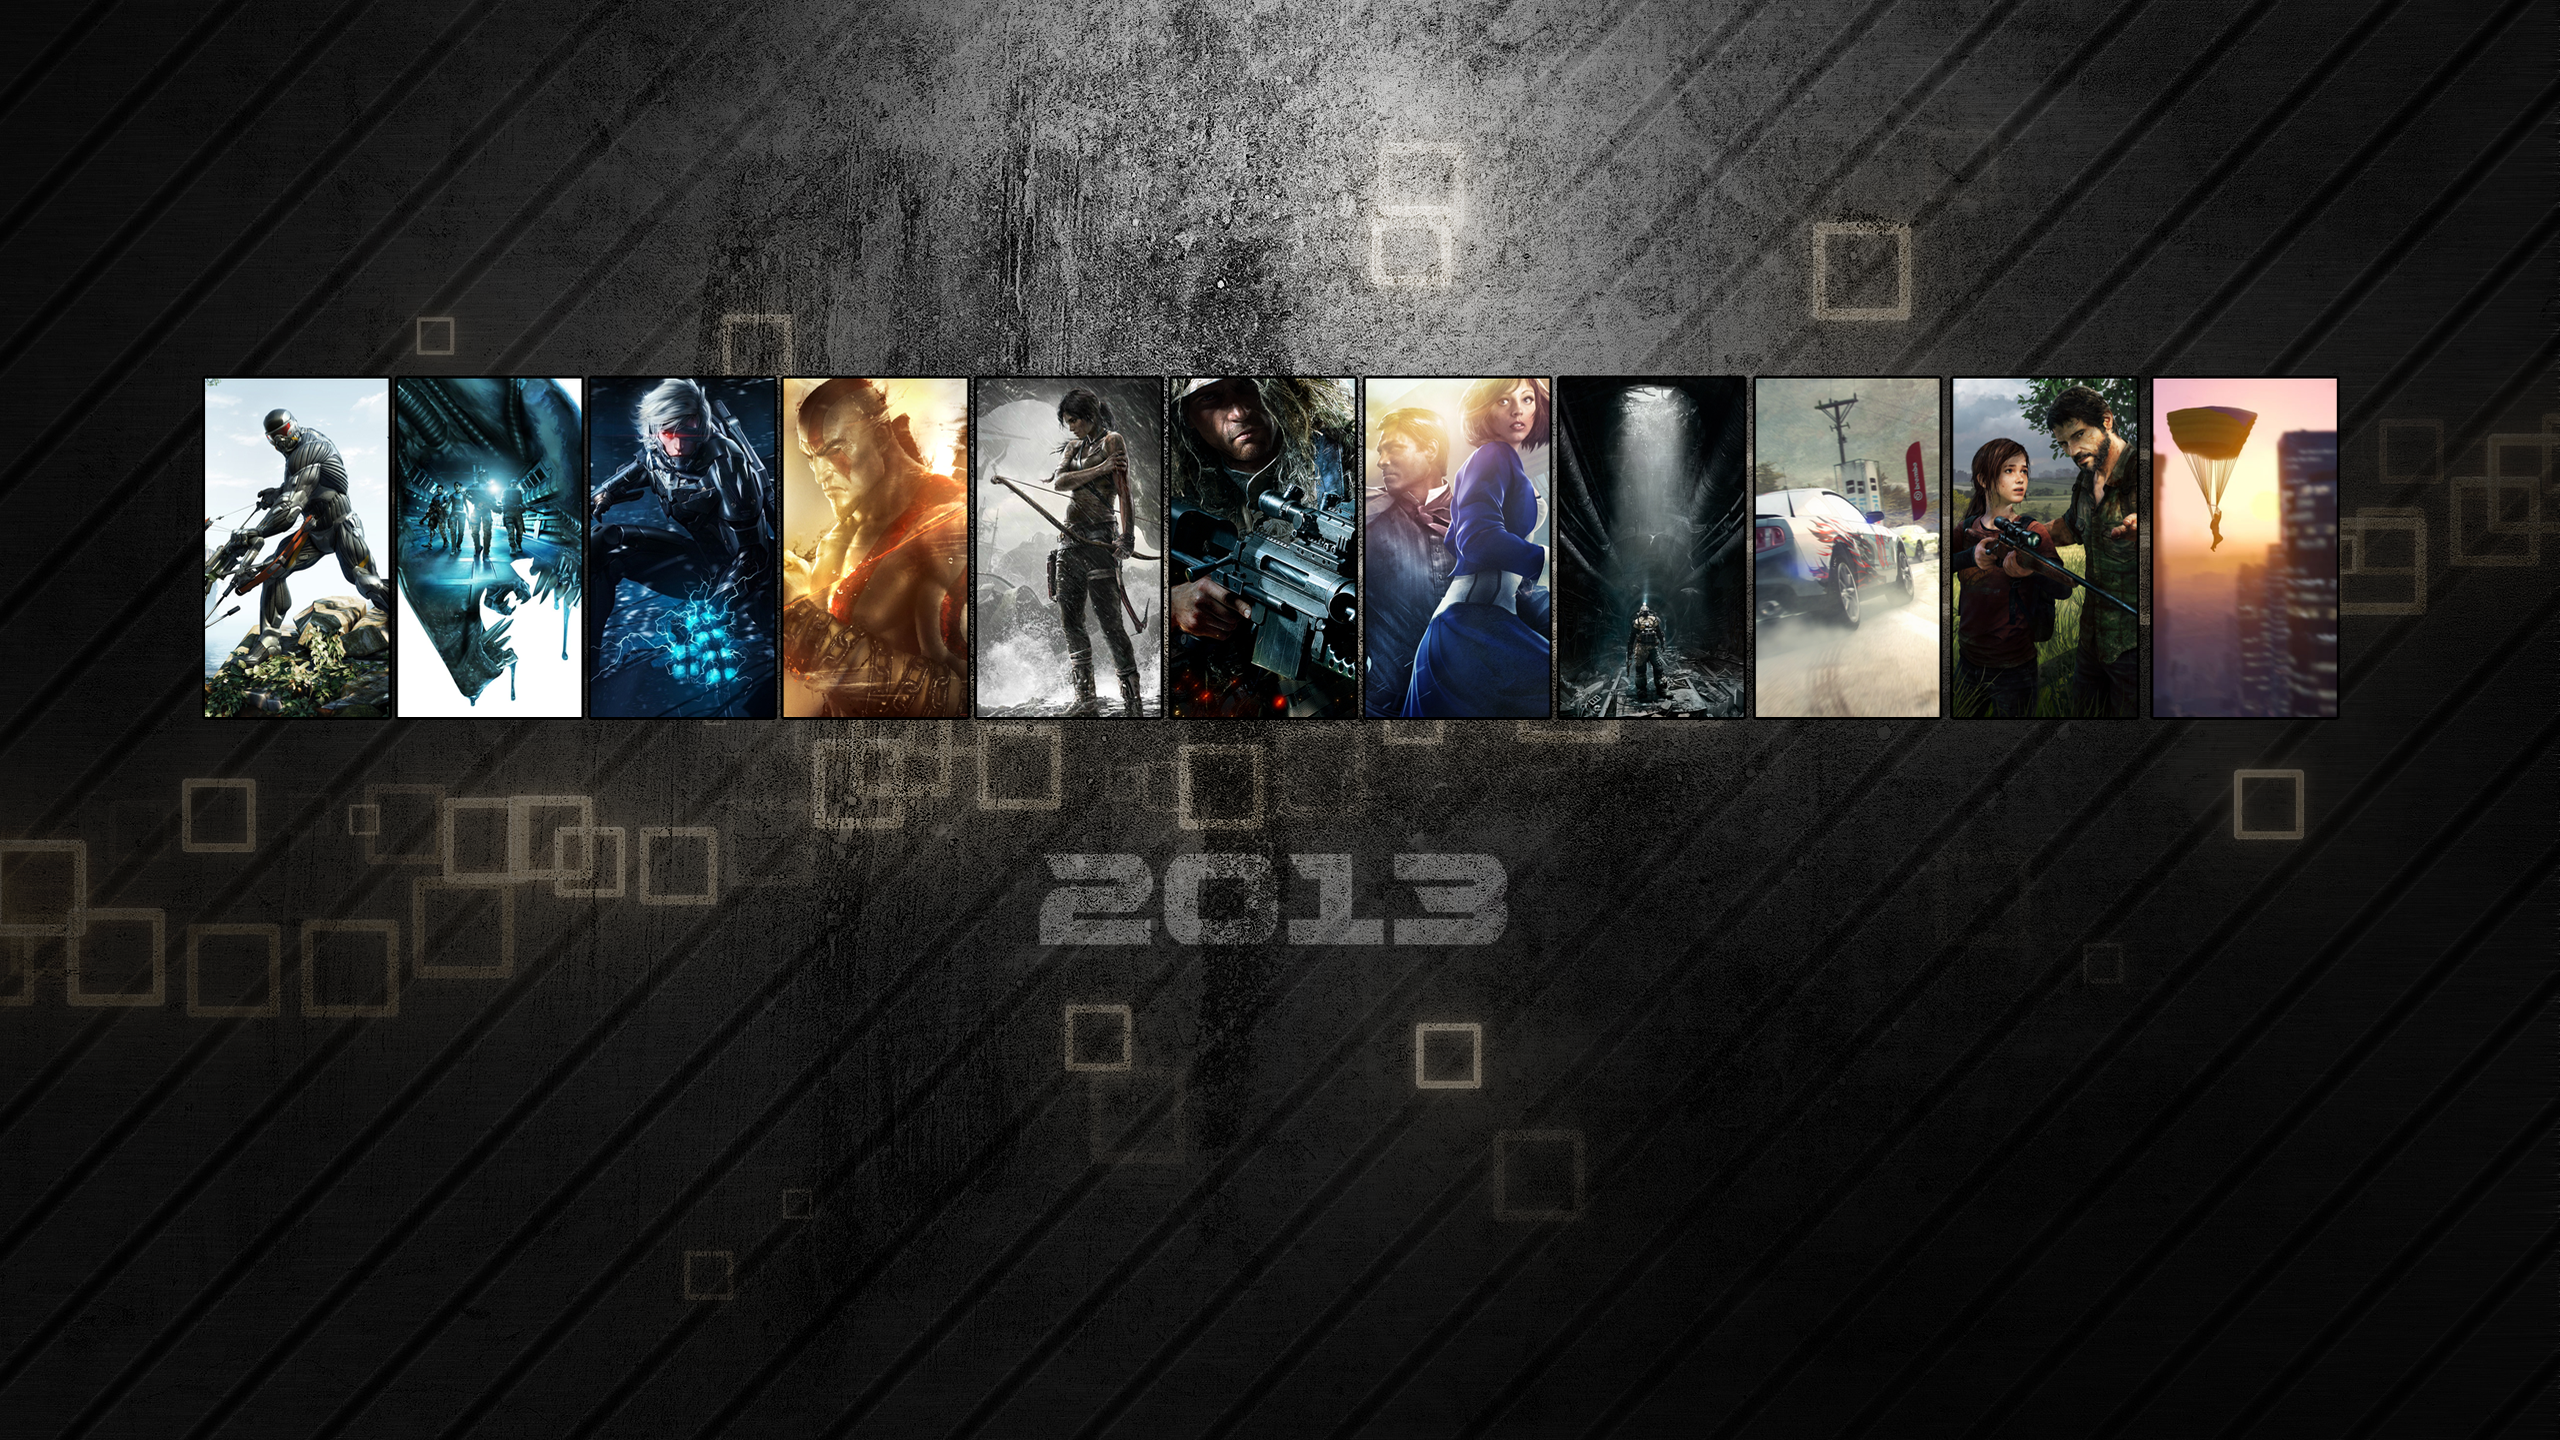 Games of 2013 wallpaper   1024075 2560x1440